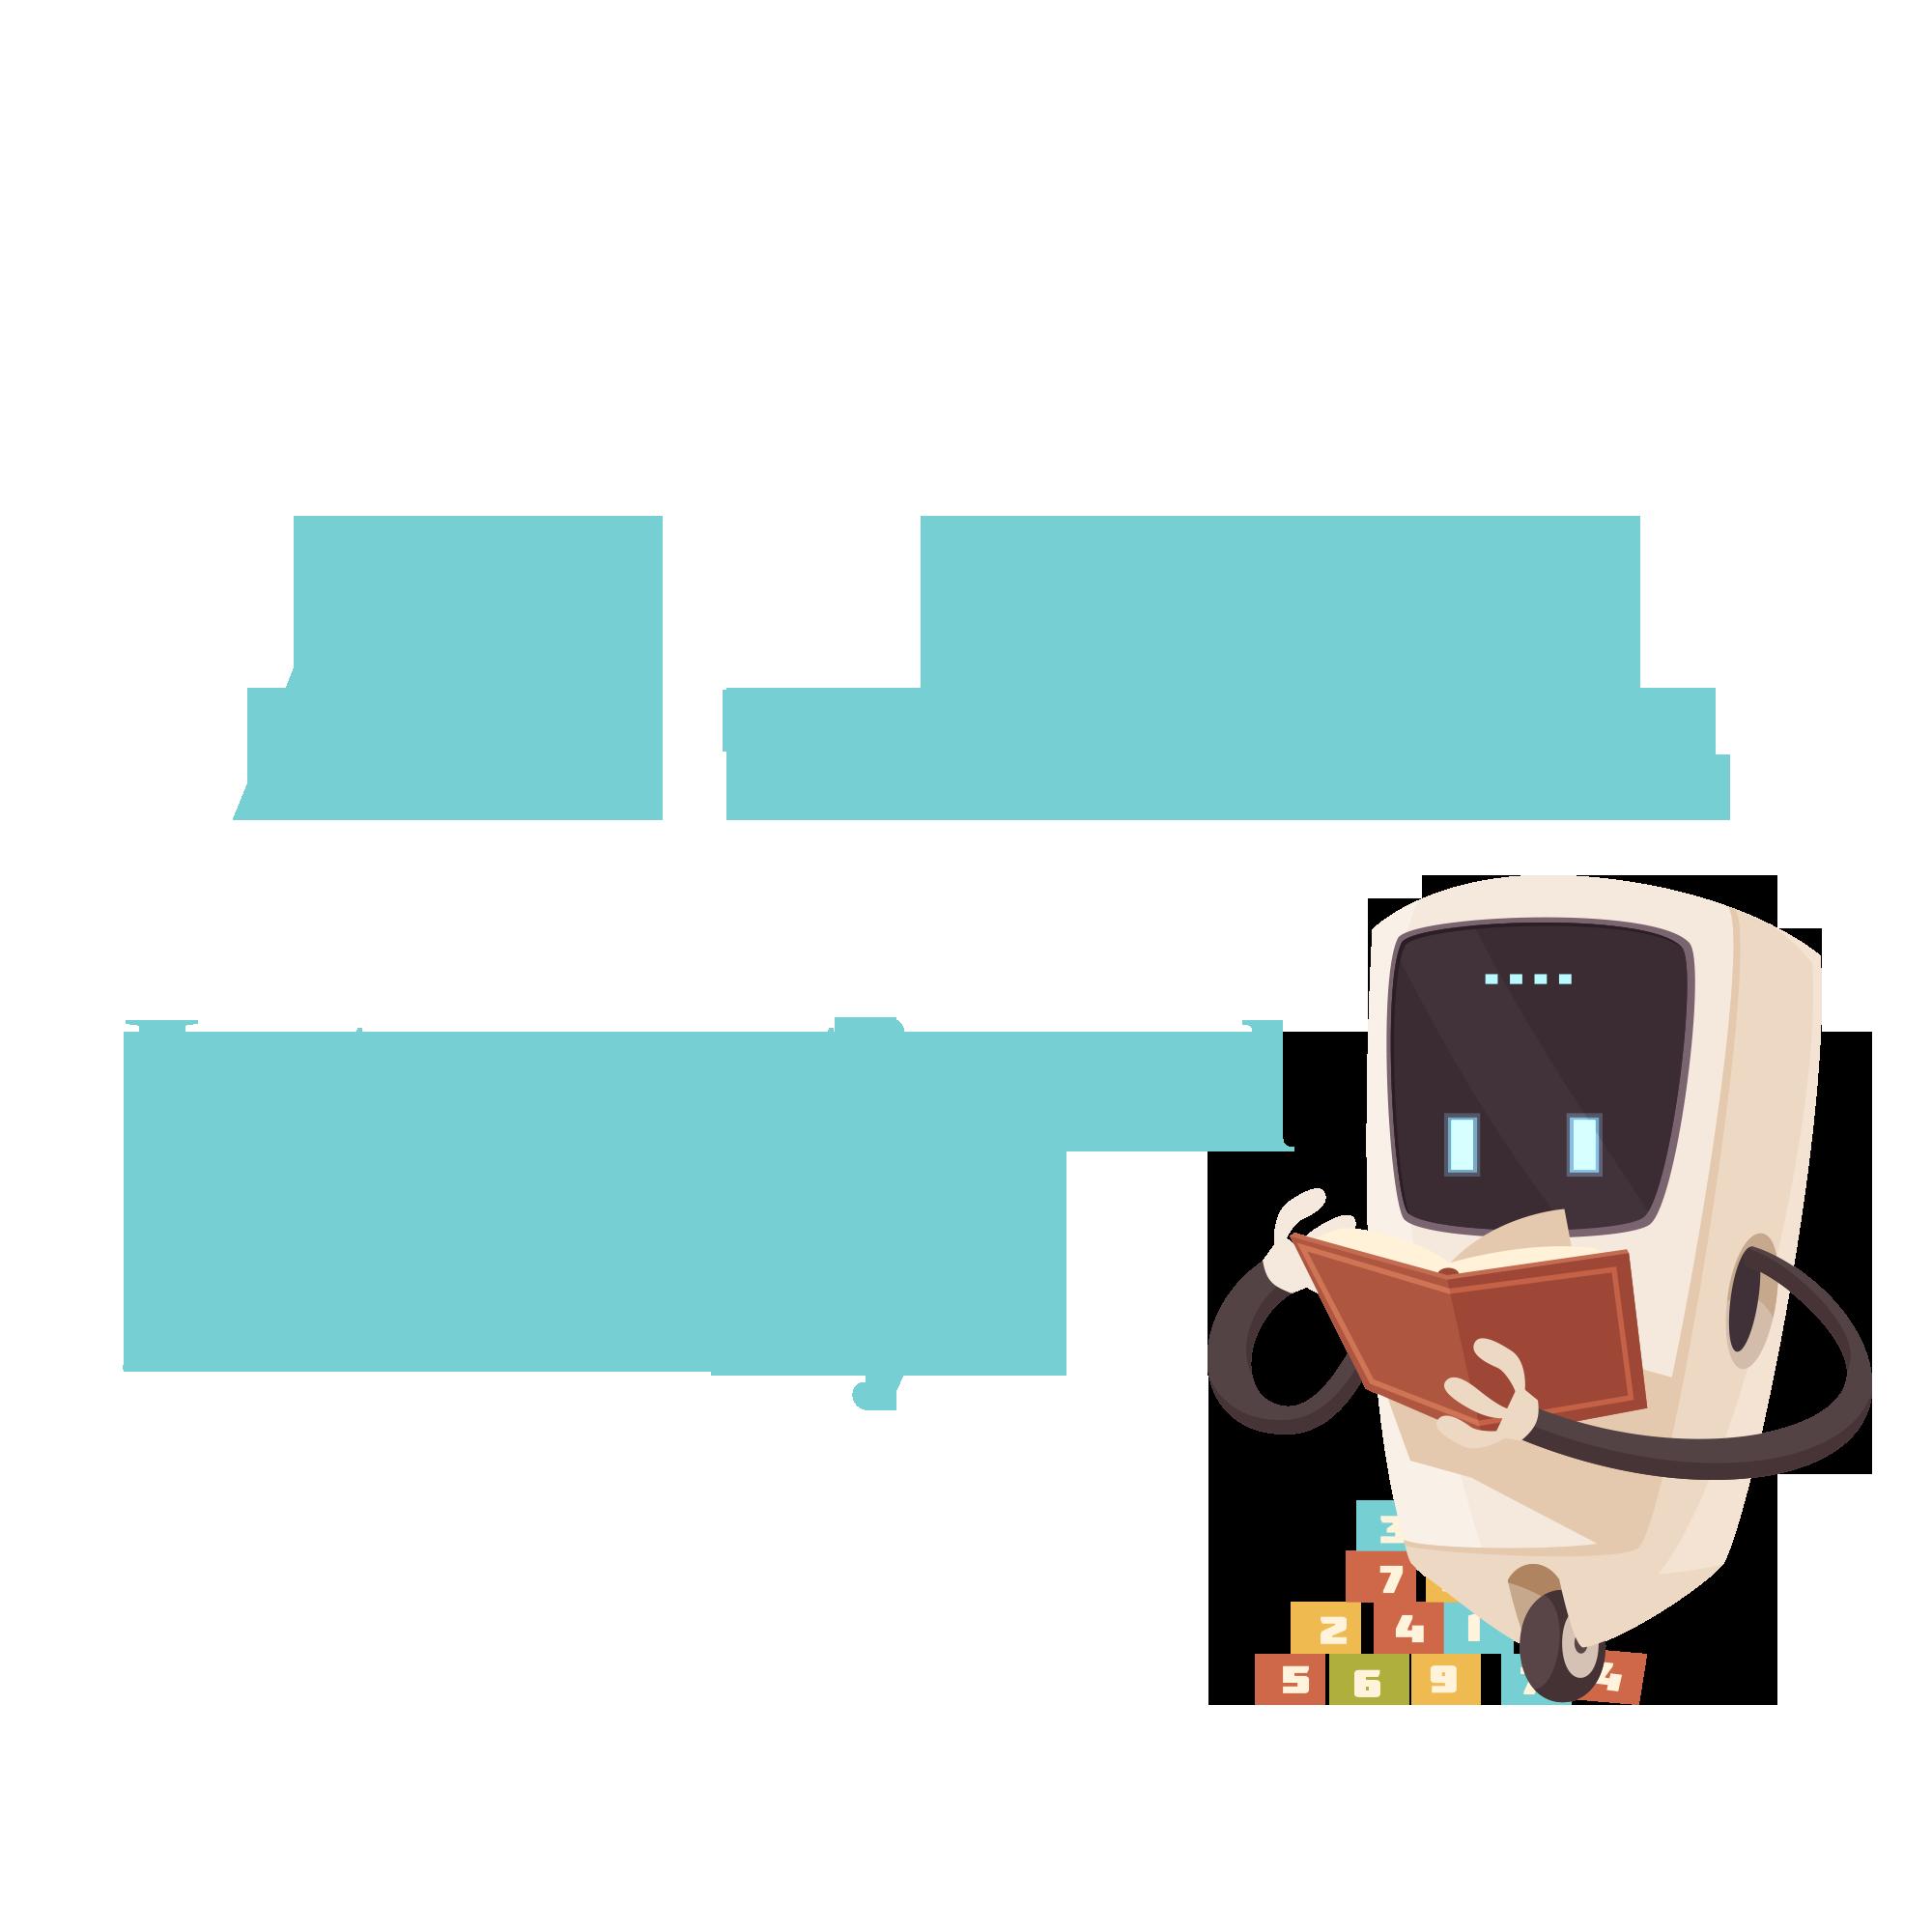 AI-FML 未來生活應用及FUZZ—IEEE 2021 年國際競賽介紹